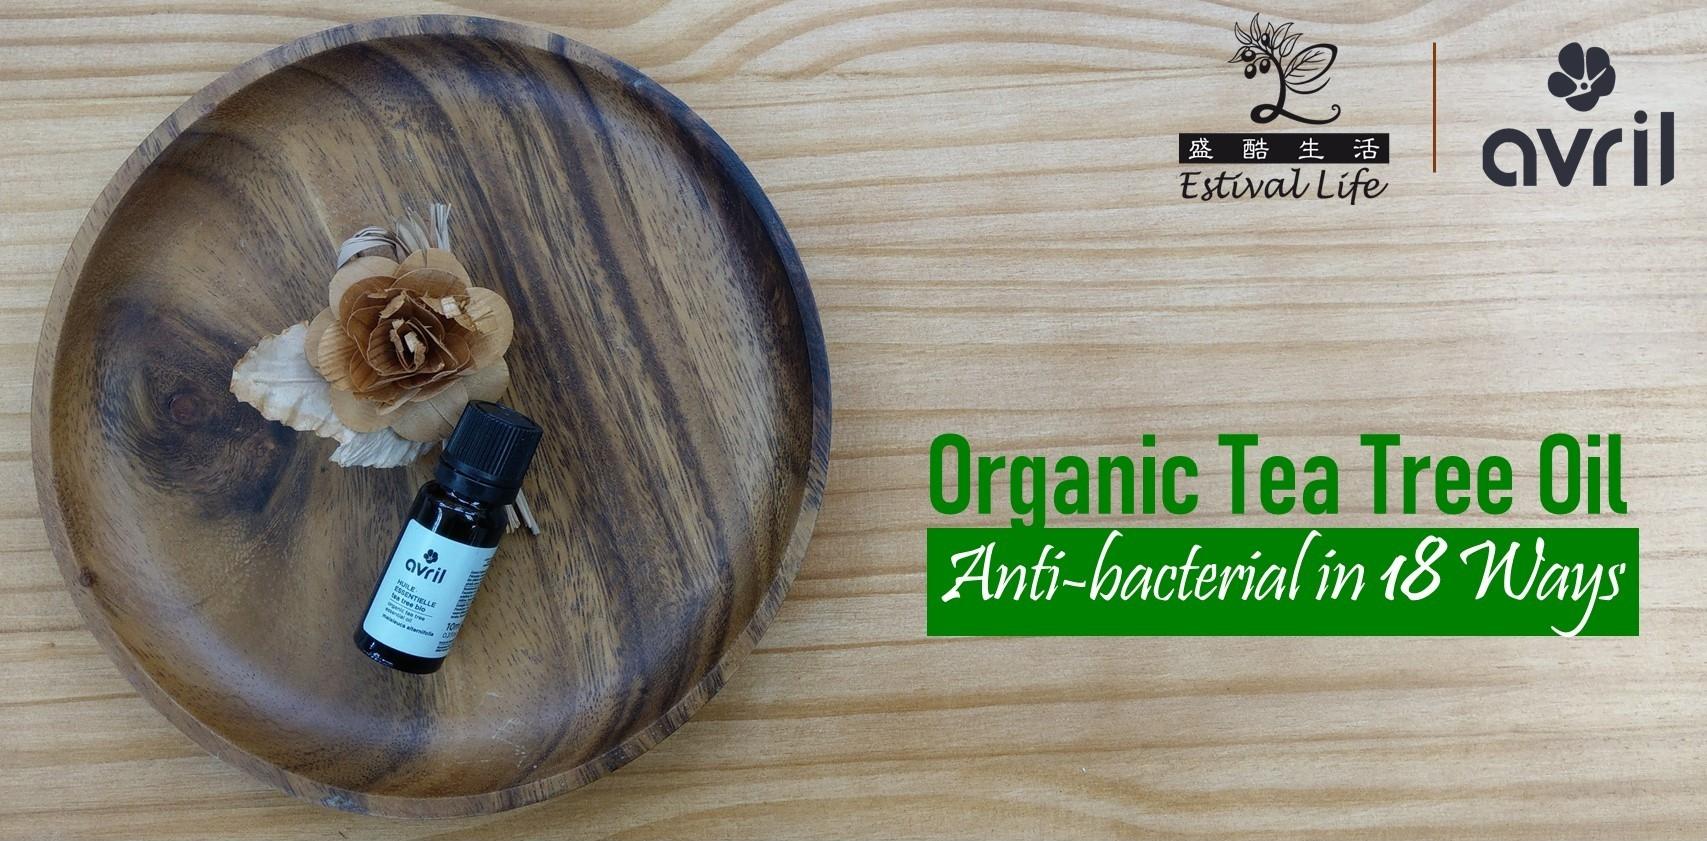 Avril, certified organic, ECOCERT, 有機認證, 茶樹油, 精油, essential oil, tea tree oil, 純素產品, vegan,